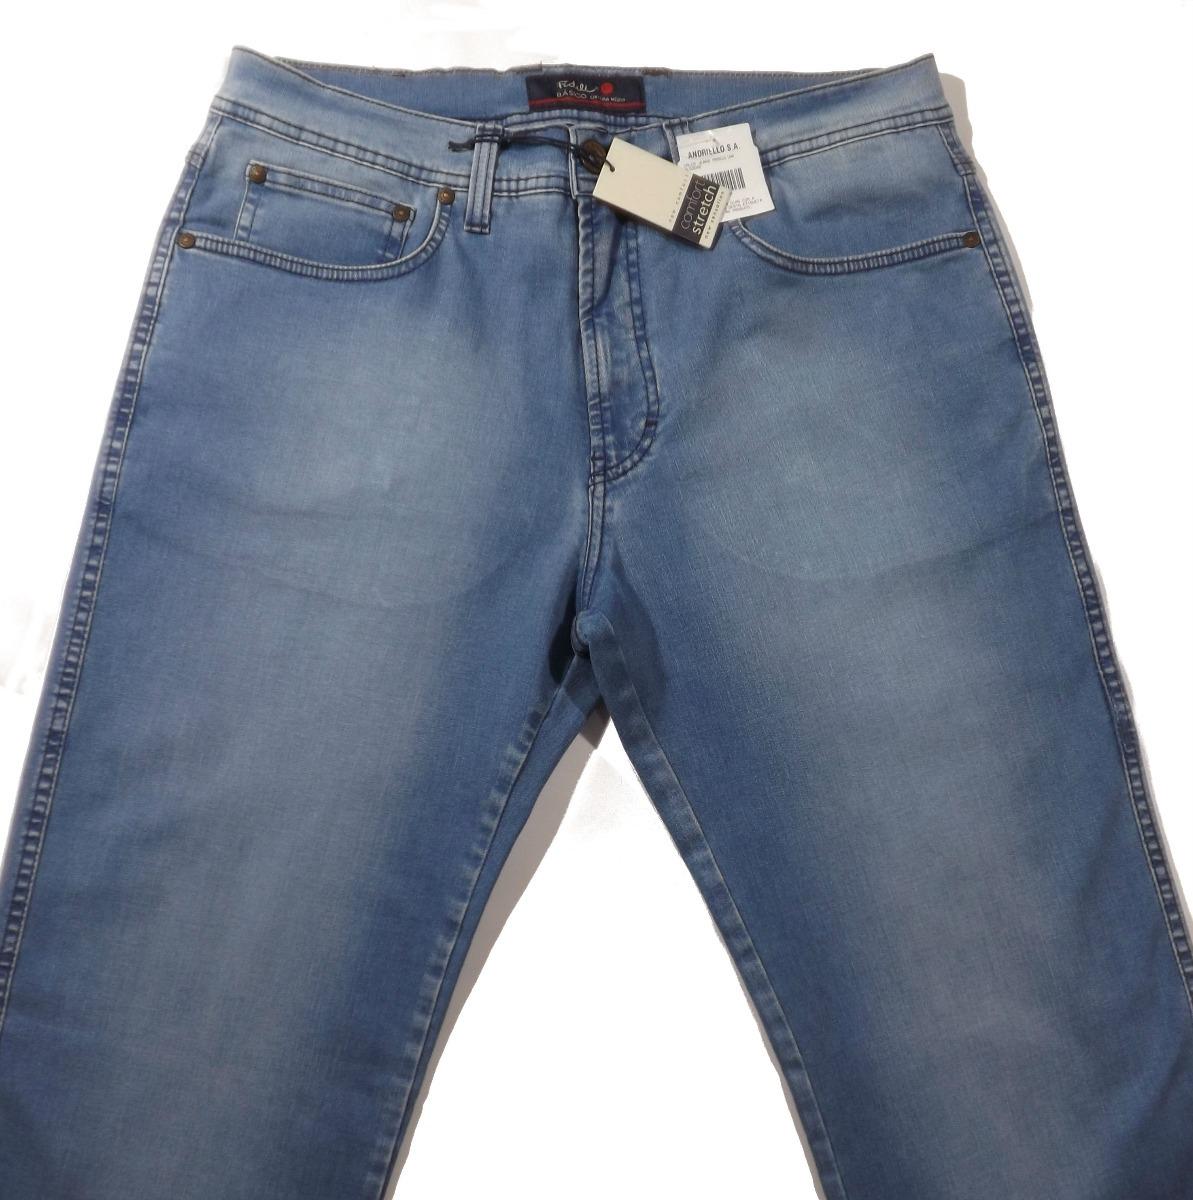 829c06590 calça jeans fideli tradic masculina-uni000554-universizeplus. Carregando  zoom.